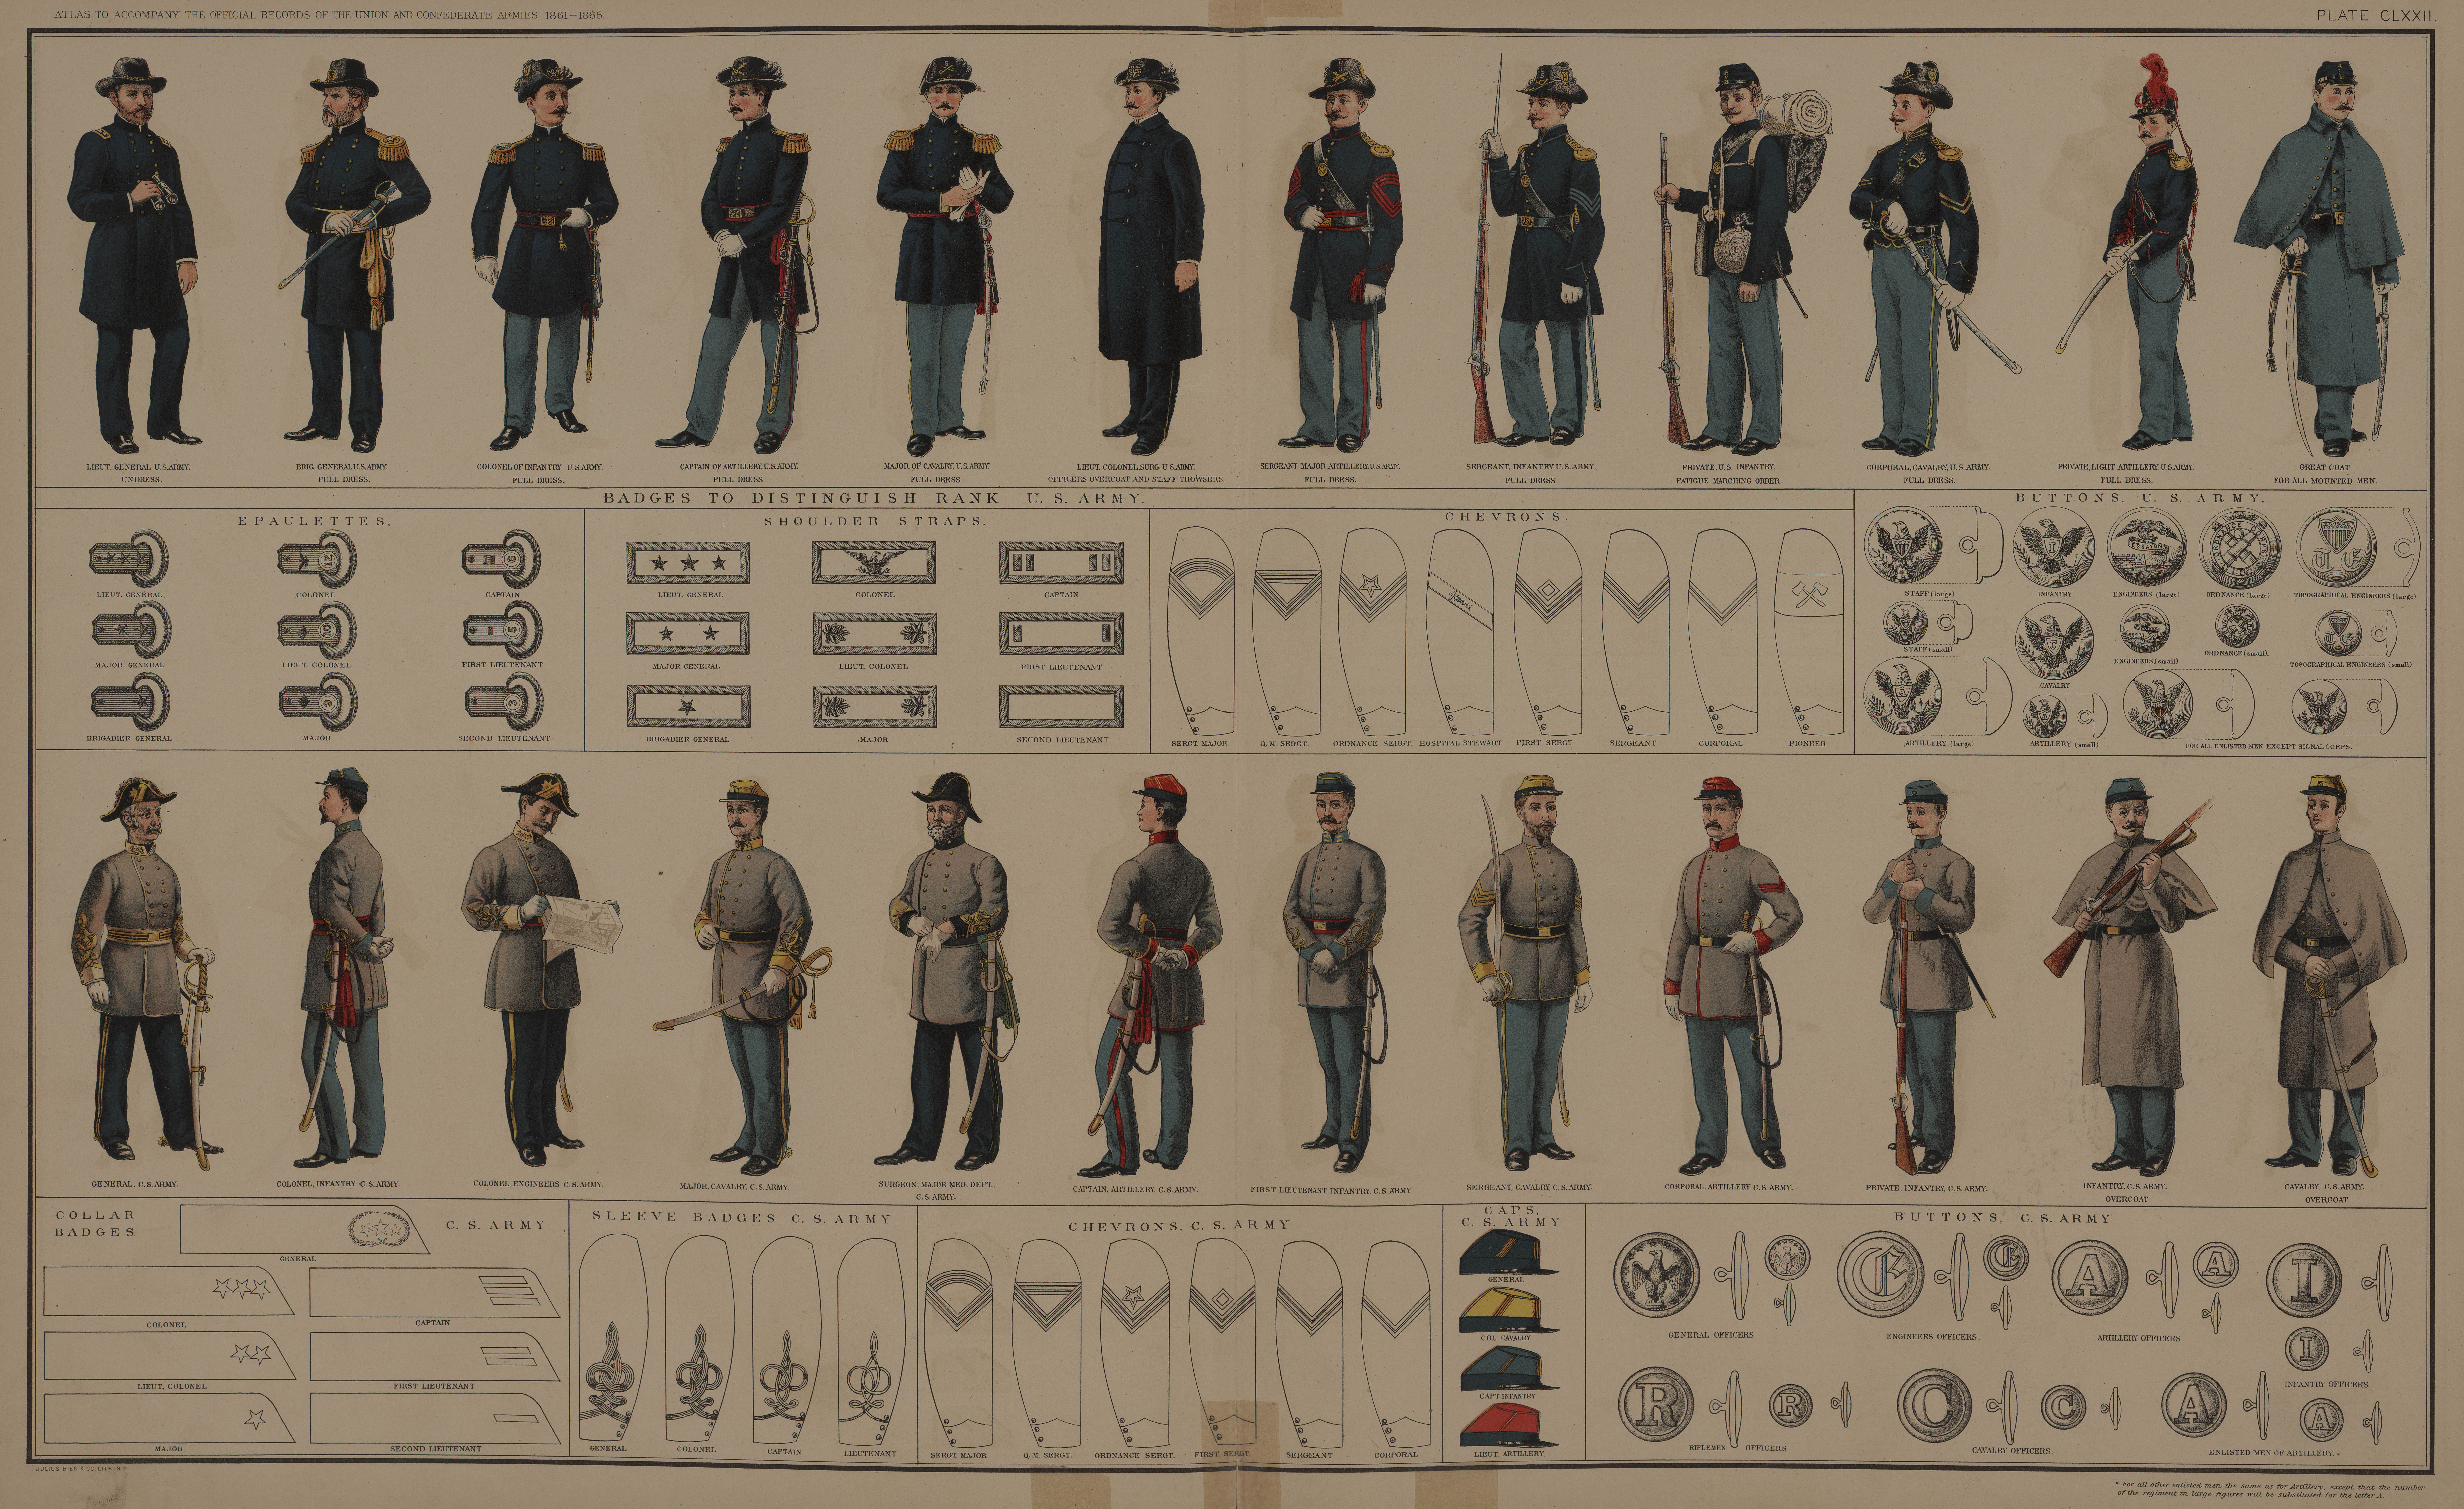 union army uniforms